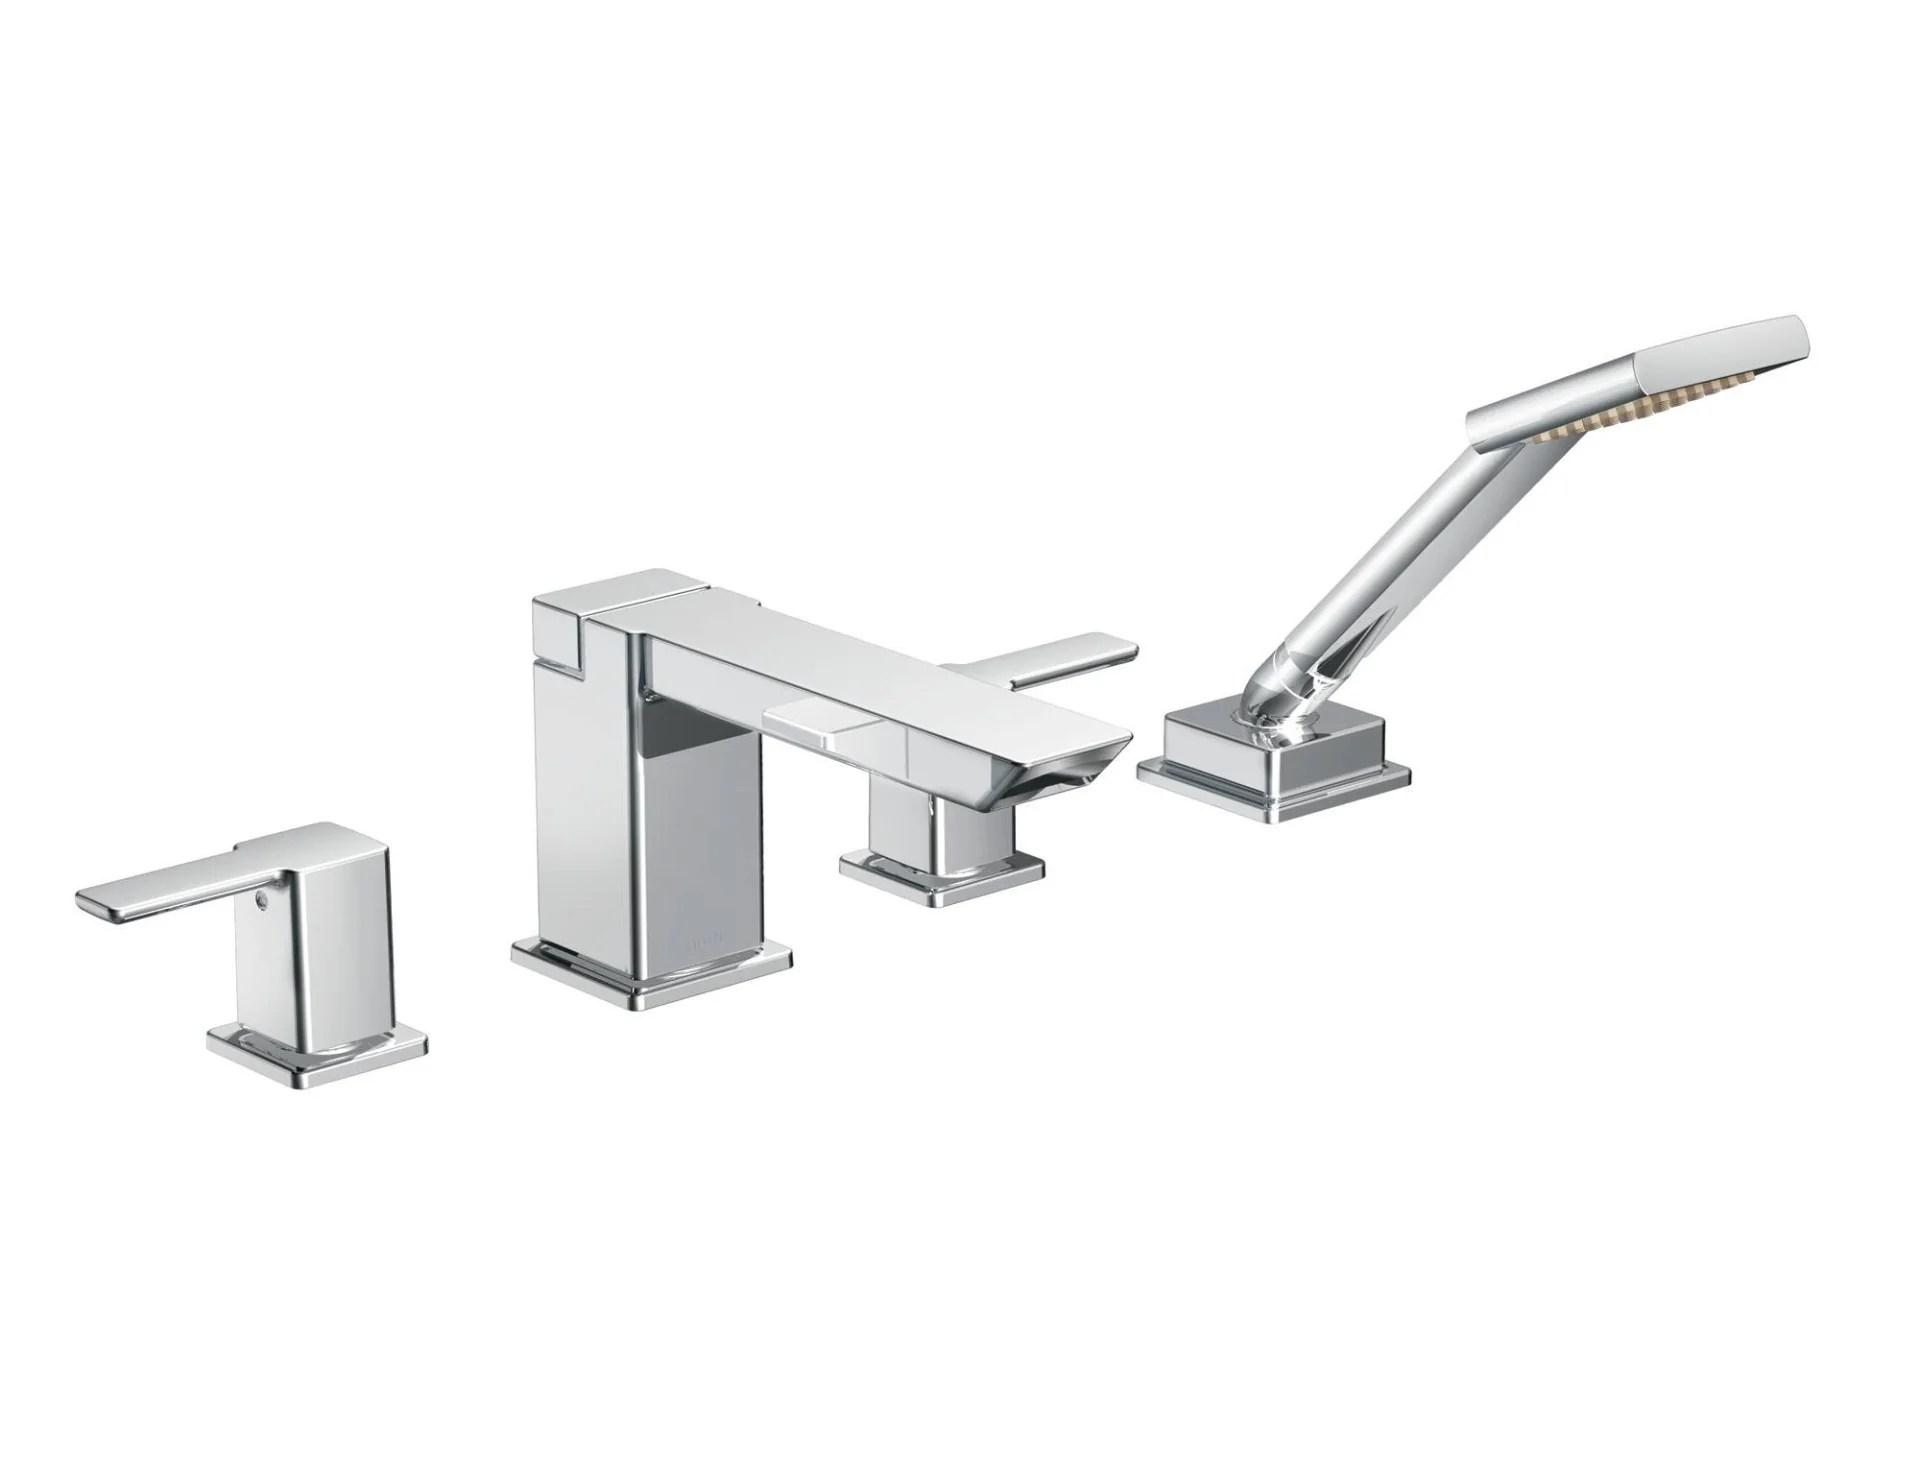 90 Degree Moen Tub Faucet Handheld Shower Pace